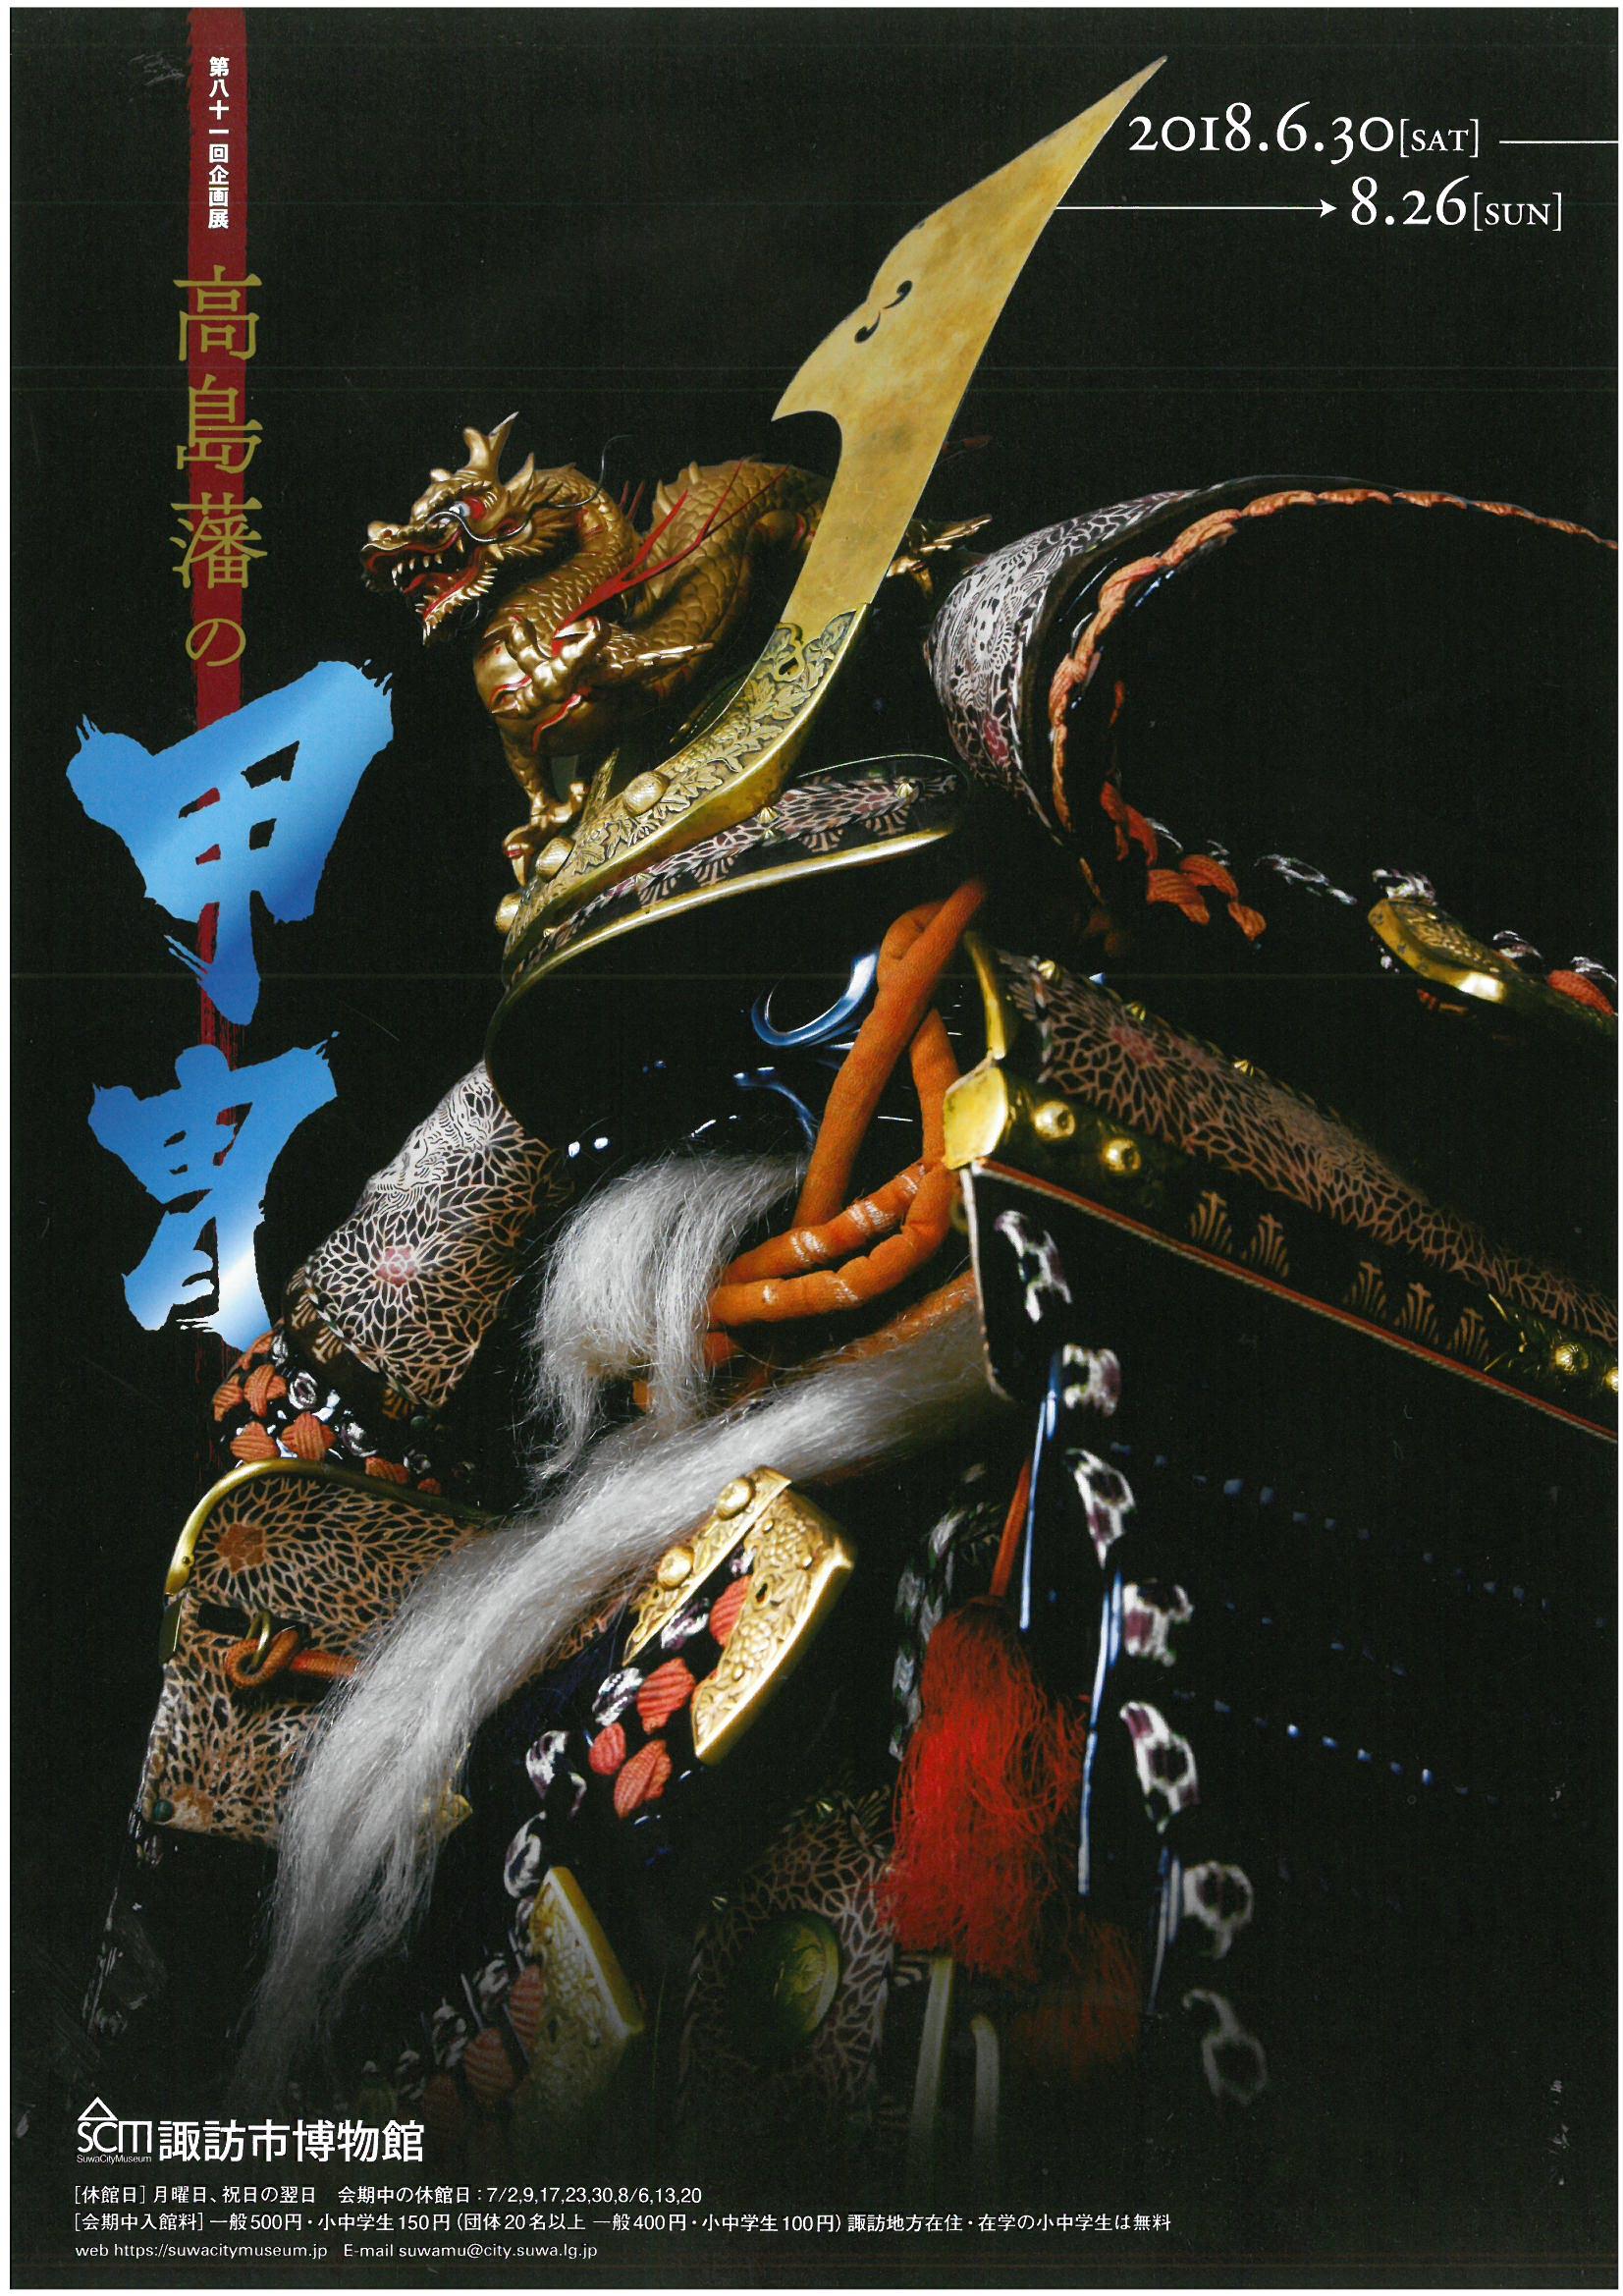 企画展「高島藩の甲冑」